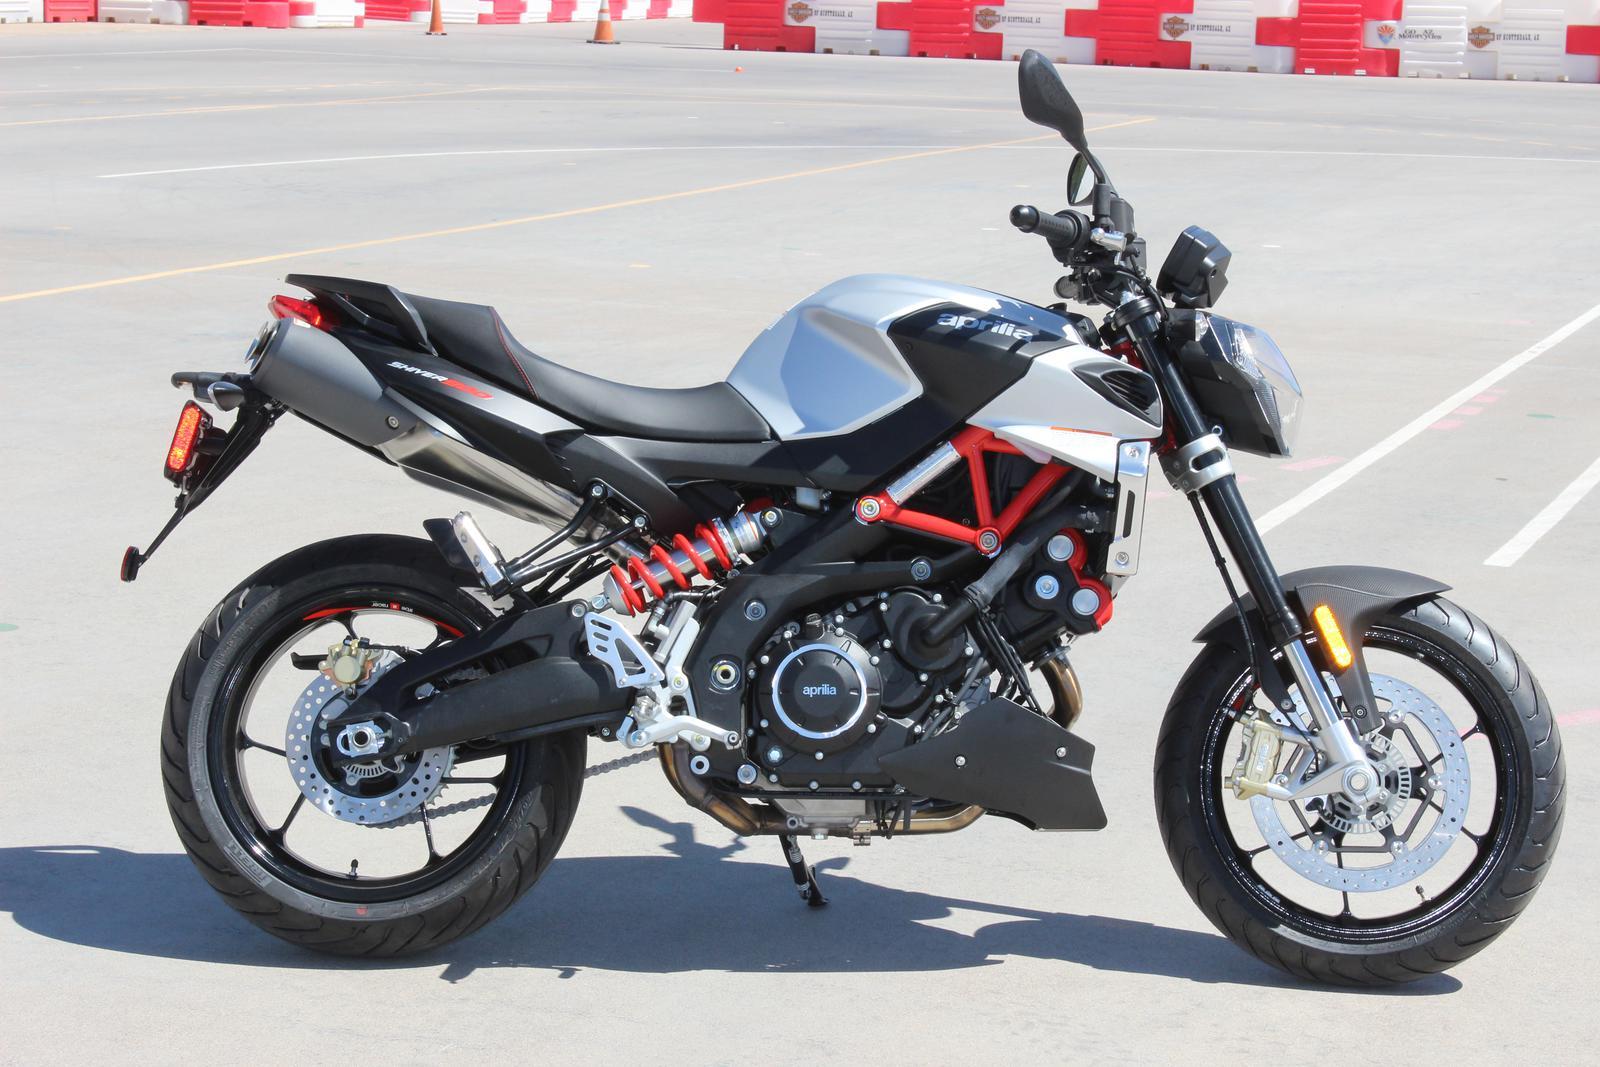 CHIAVI PER MOTOCROSS APRILIA SHIVER 900